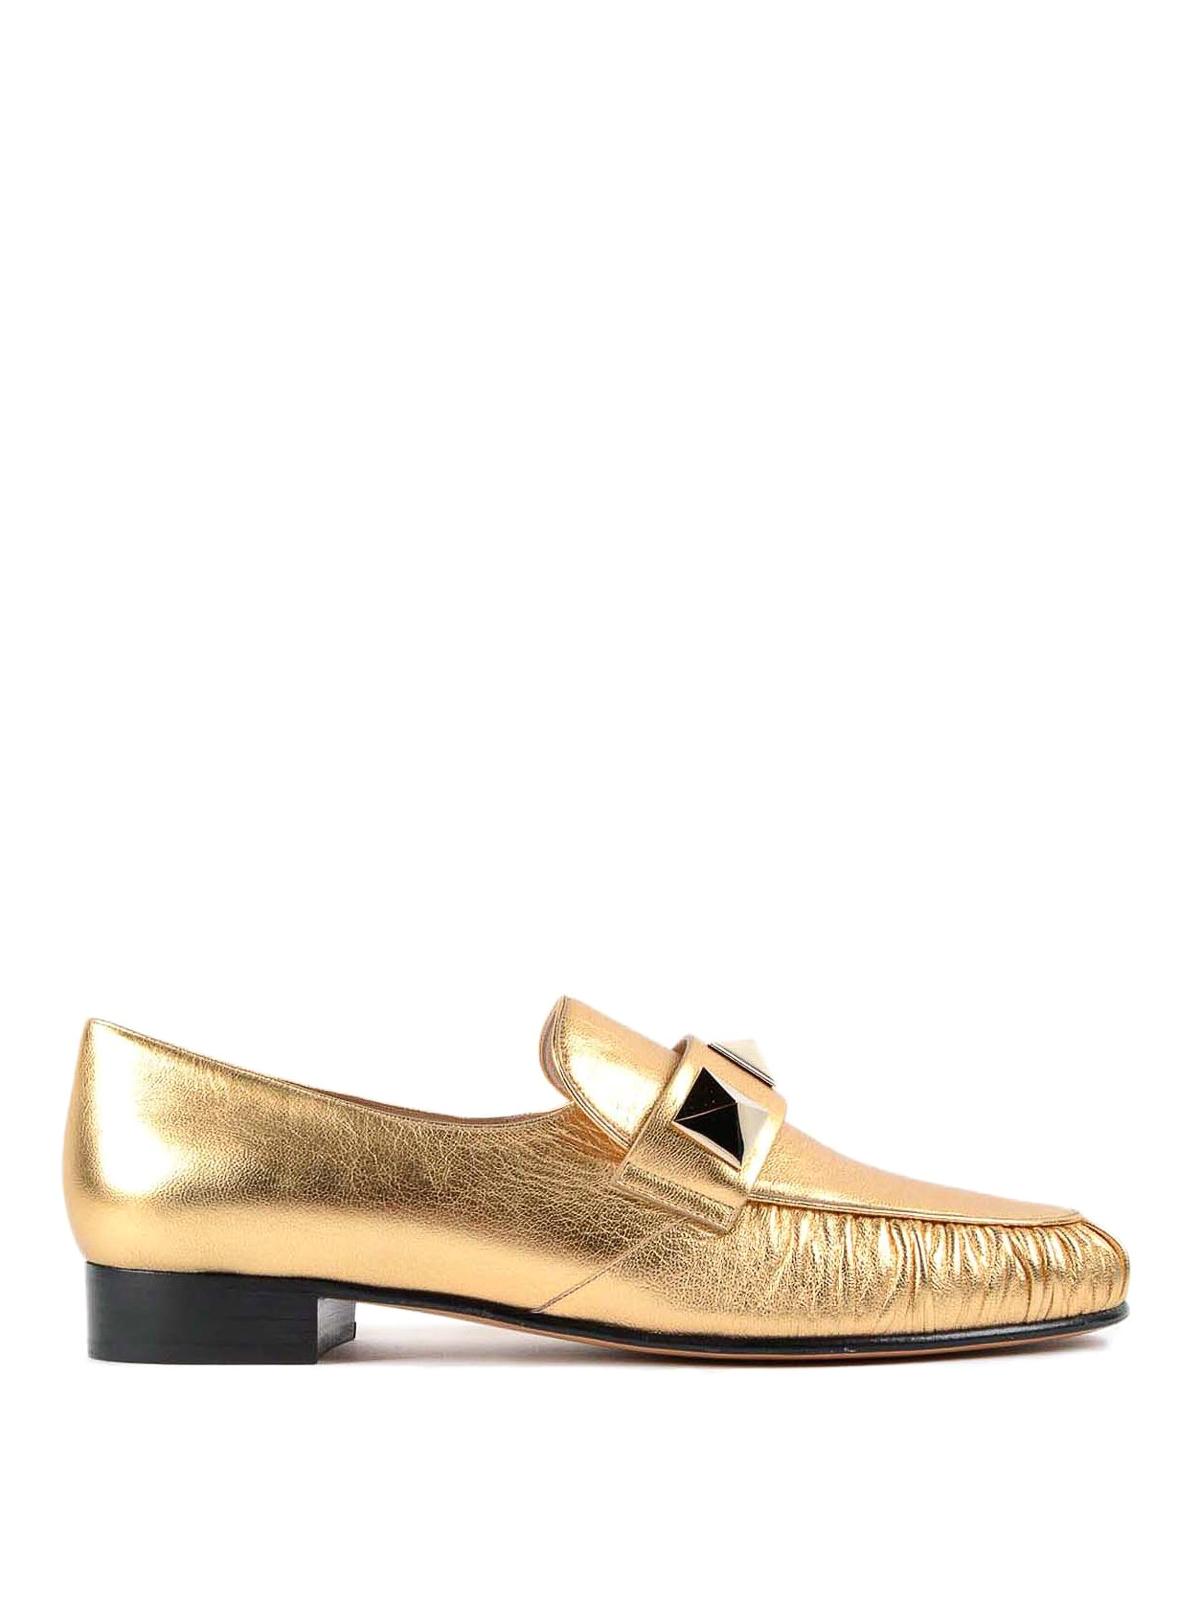 1c75c6f15b4 Valentino Garavani - Macro studs detail loafers - Loafers   Slippers ...